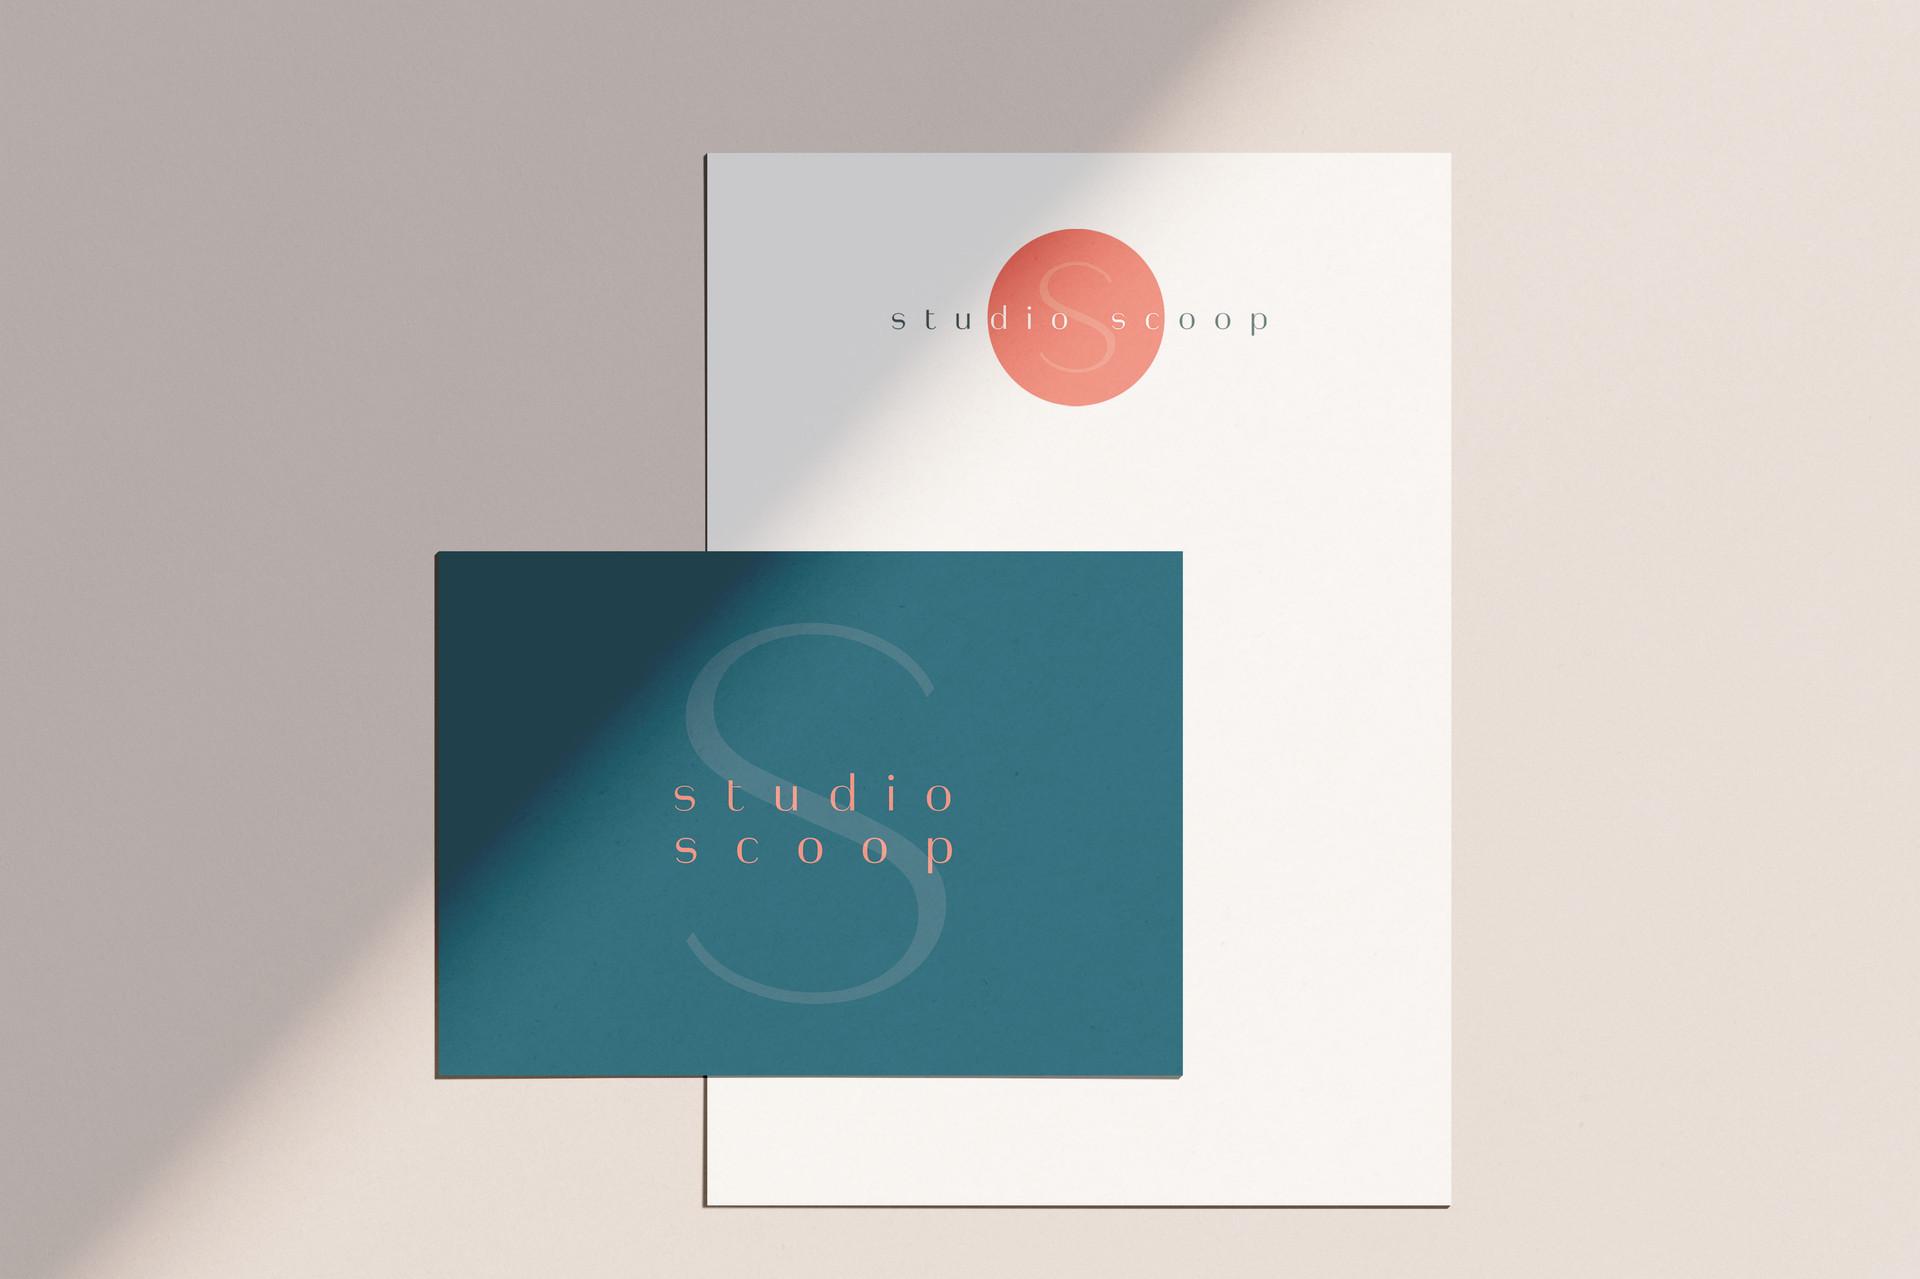 Scoop Pilates Branding | Brand Identity Design by Fresh Leaf Creative | Dorset Brand Designer & Photographer